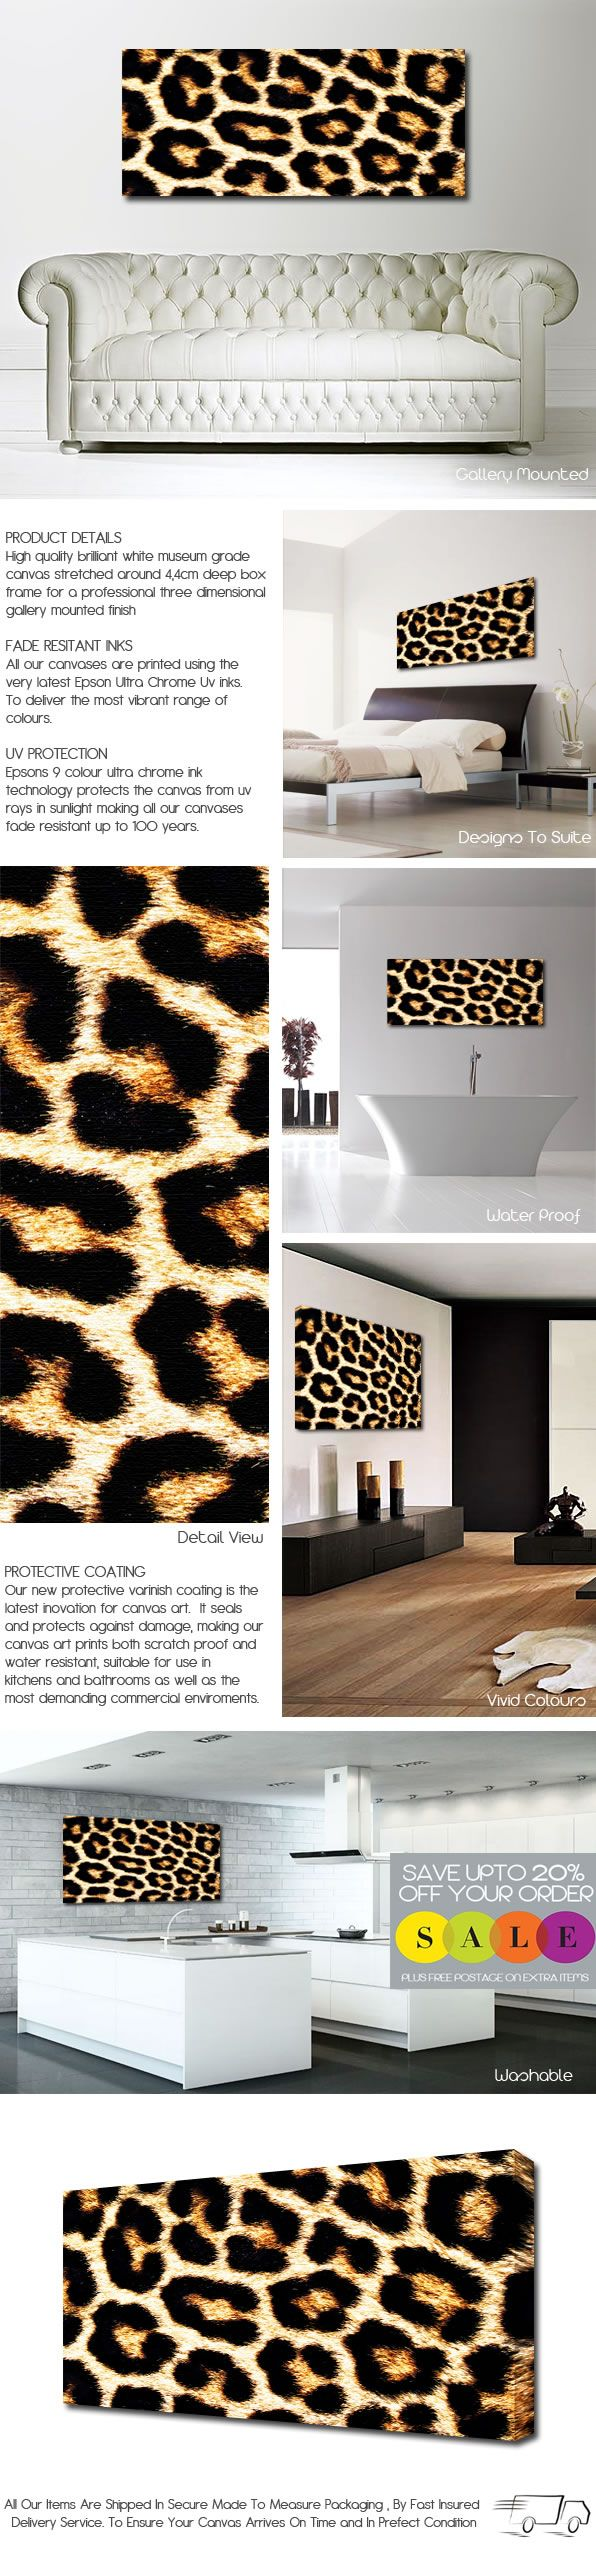 Leopard Print Canvas @Samantha @This Home Sweet Home Blog @AbdulAziz Bukhamseen Home Sweet Home Blog Shupe